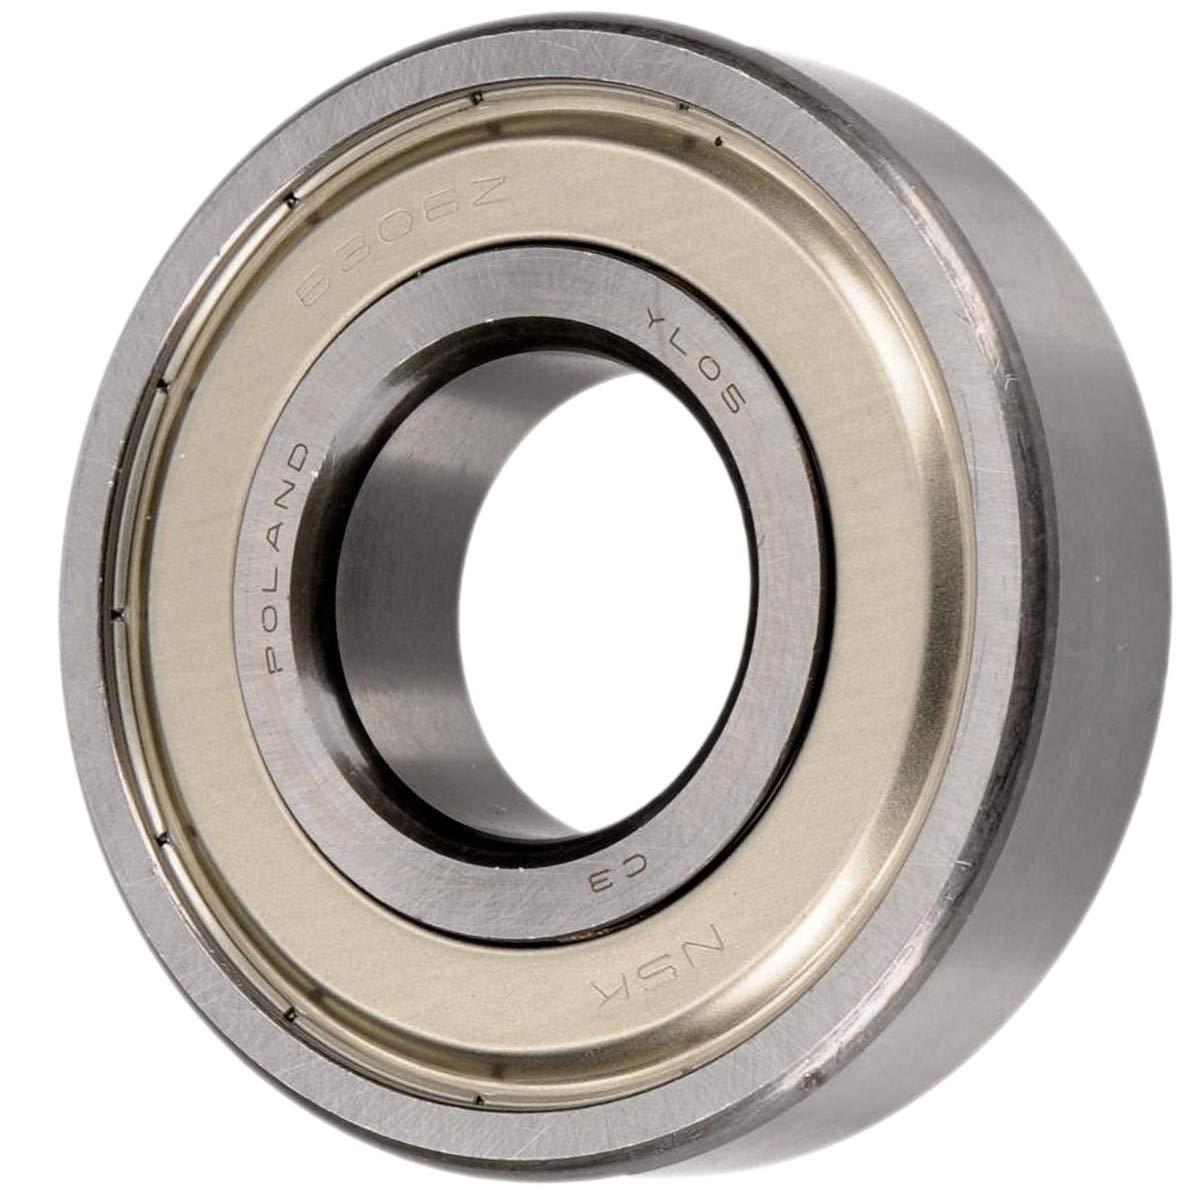 Kugellager-30-x-72-x-19-Waschmaschine-3790803005-AEG-Electrolux-Faure-Arthur-Martin-Electrolux